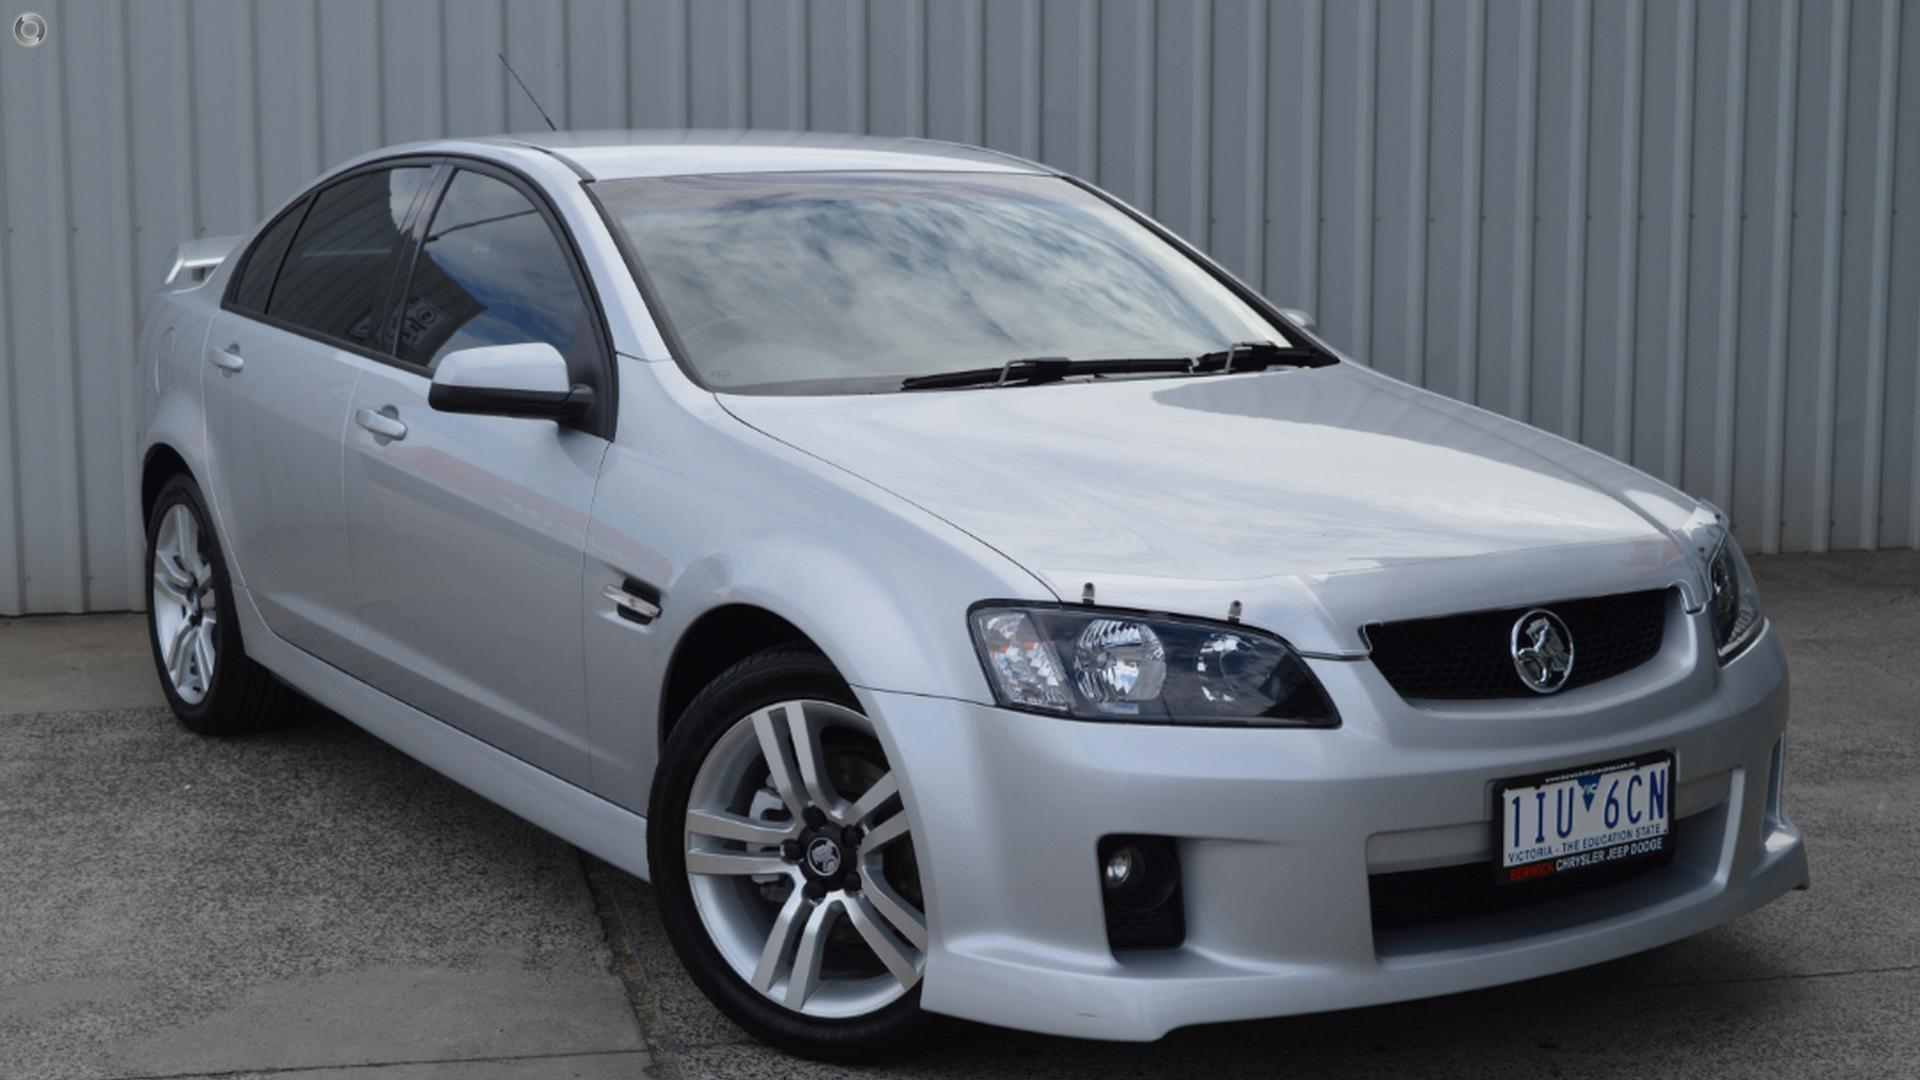 2008 Holden Commodore SV6 VE